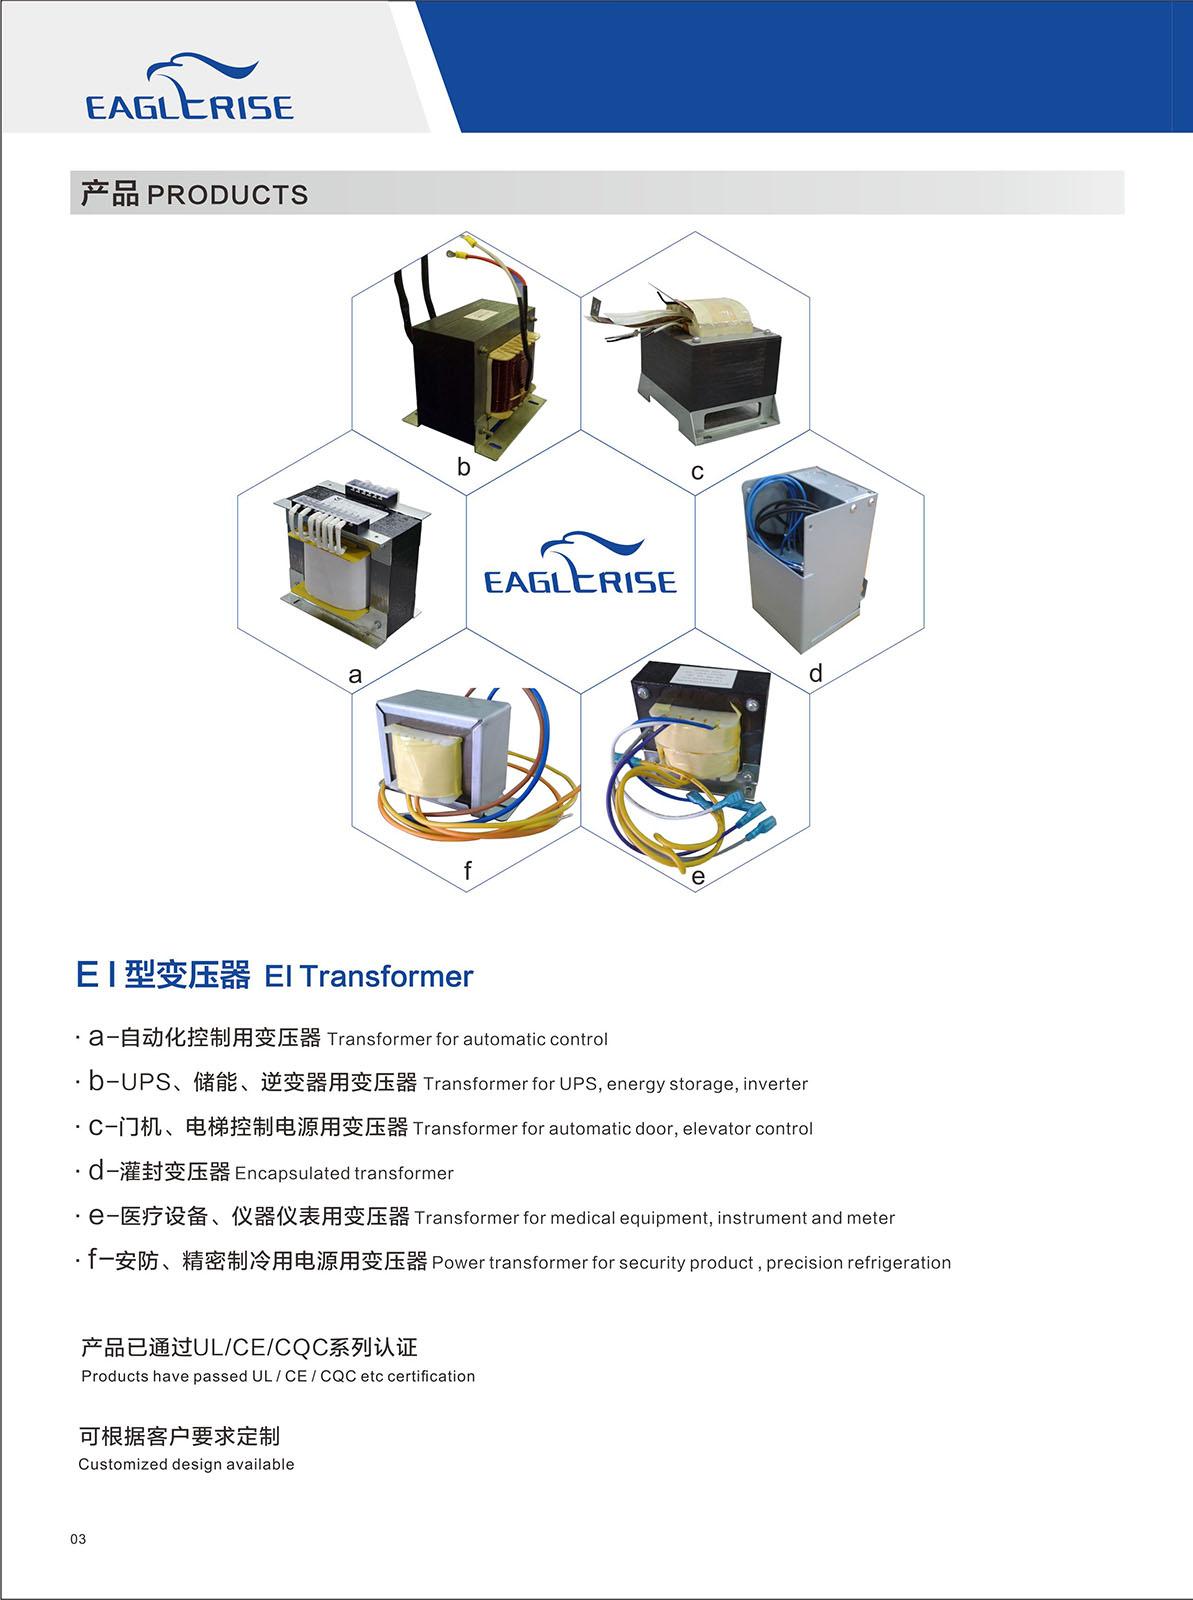 Transformer for automatic door, elevator control